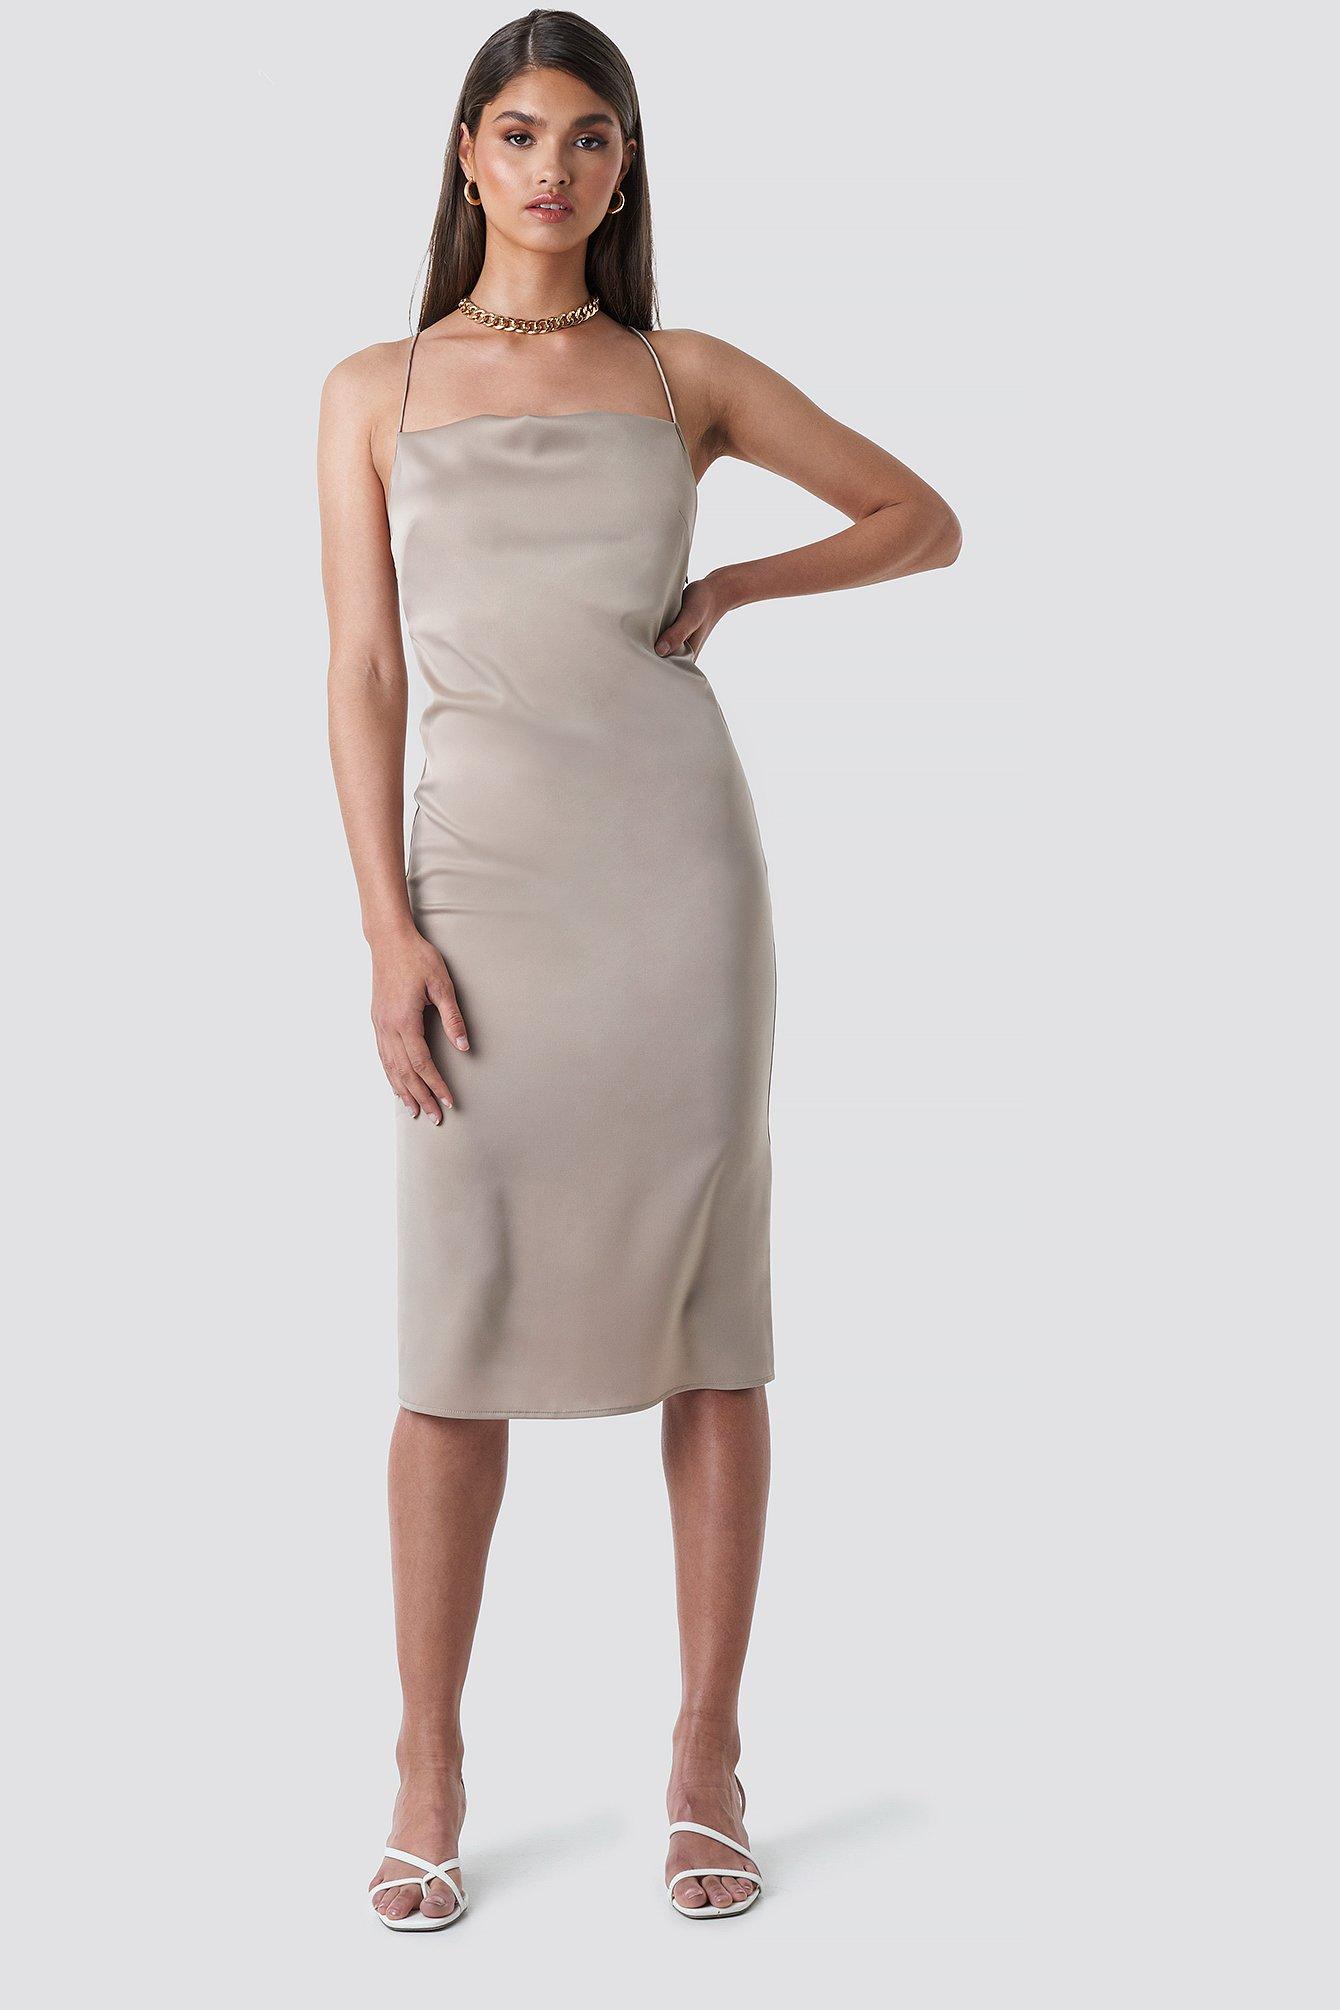 tina maria x na-kd -  Cowl Neck Satin Midi Dress - Beige